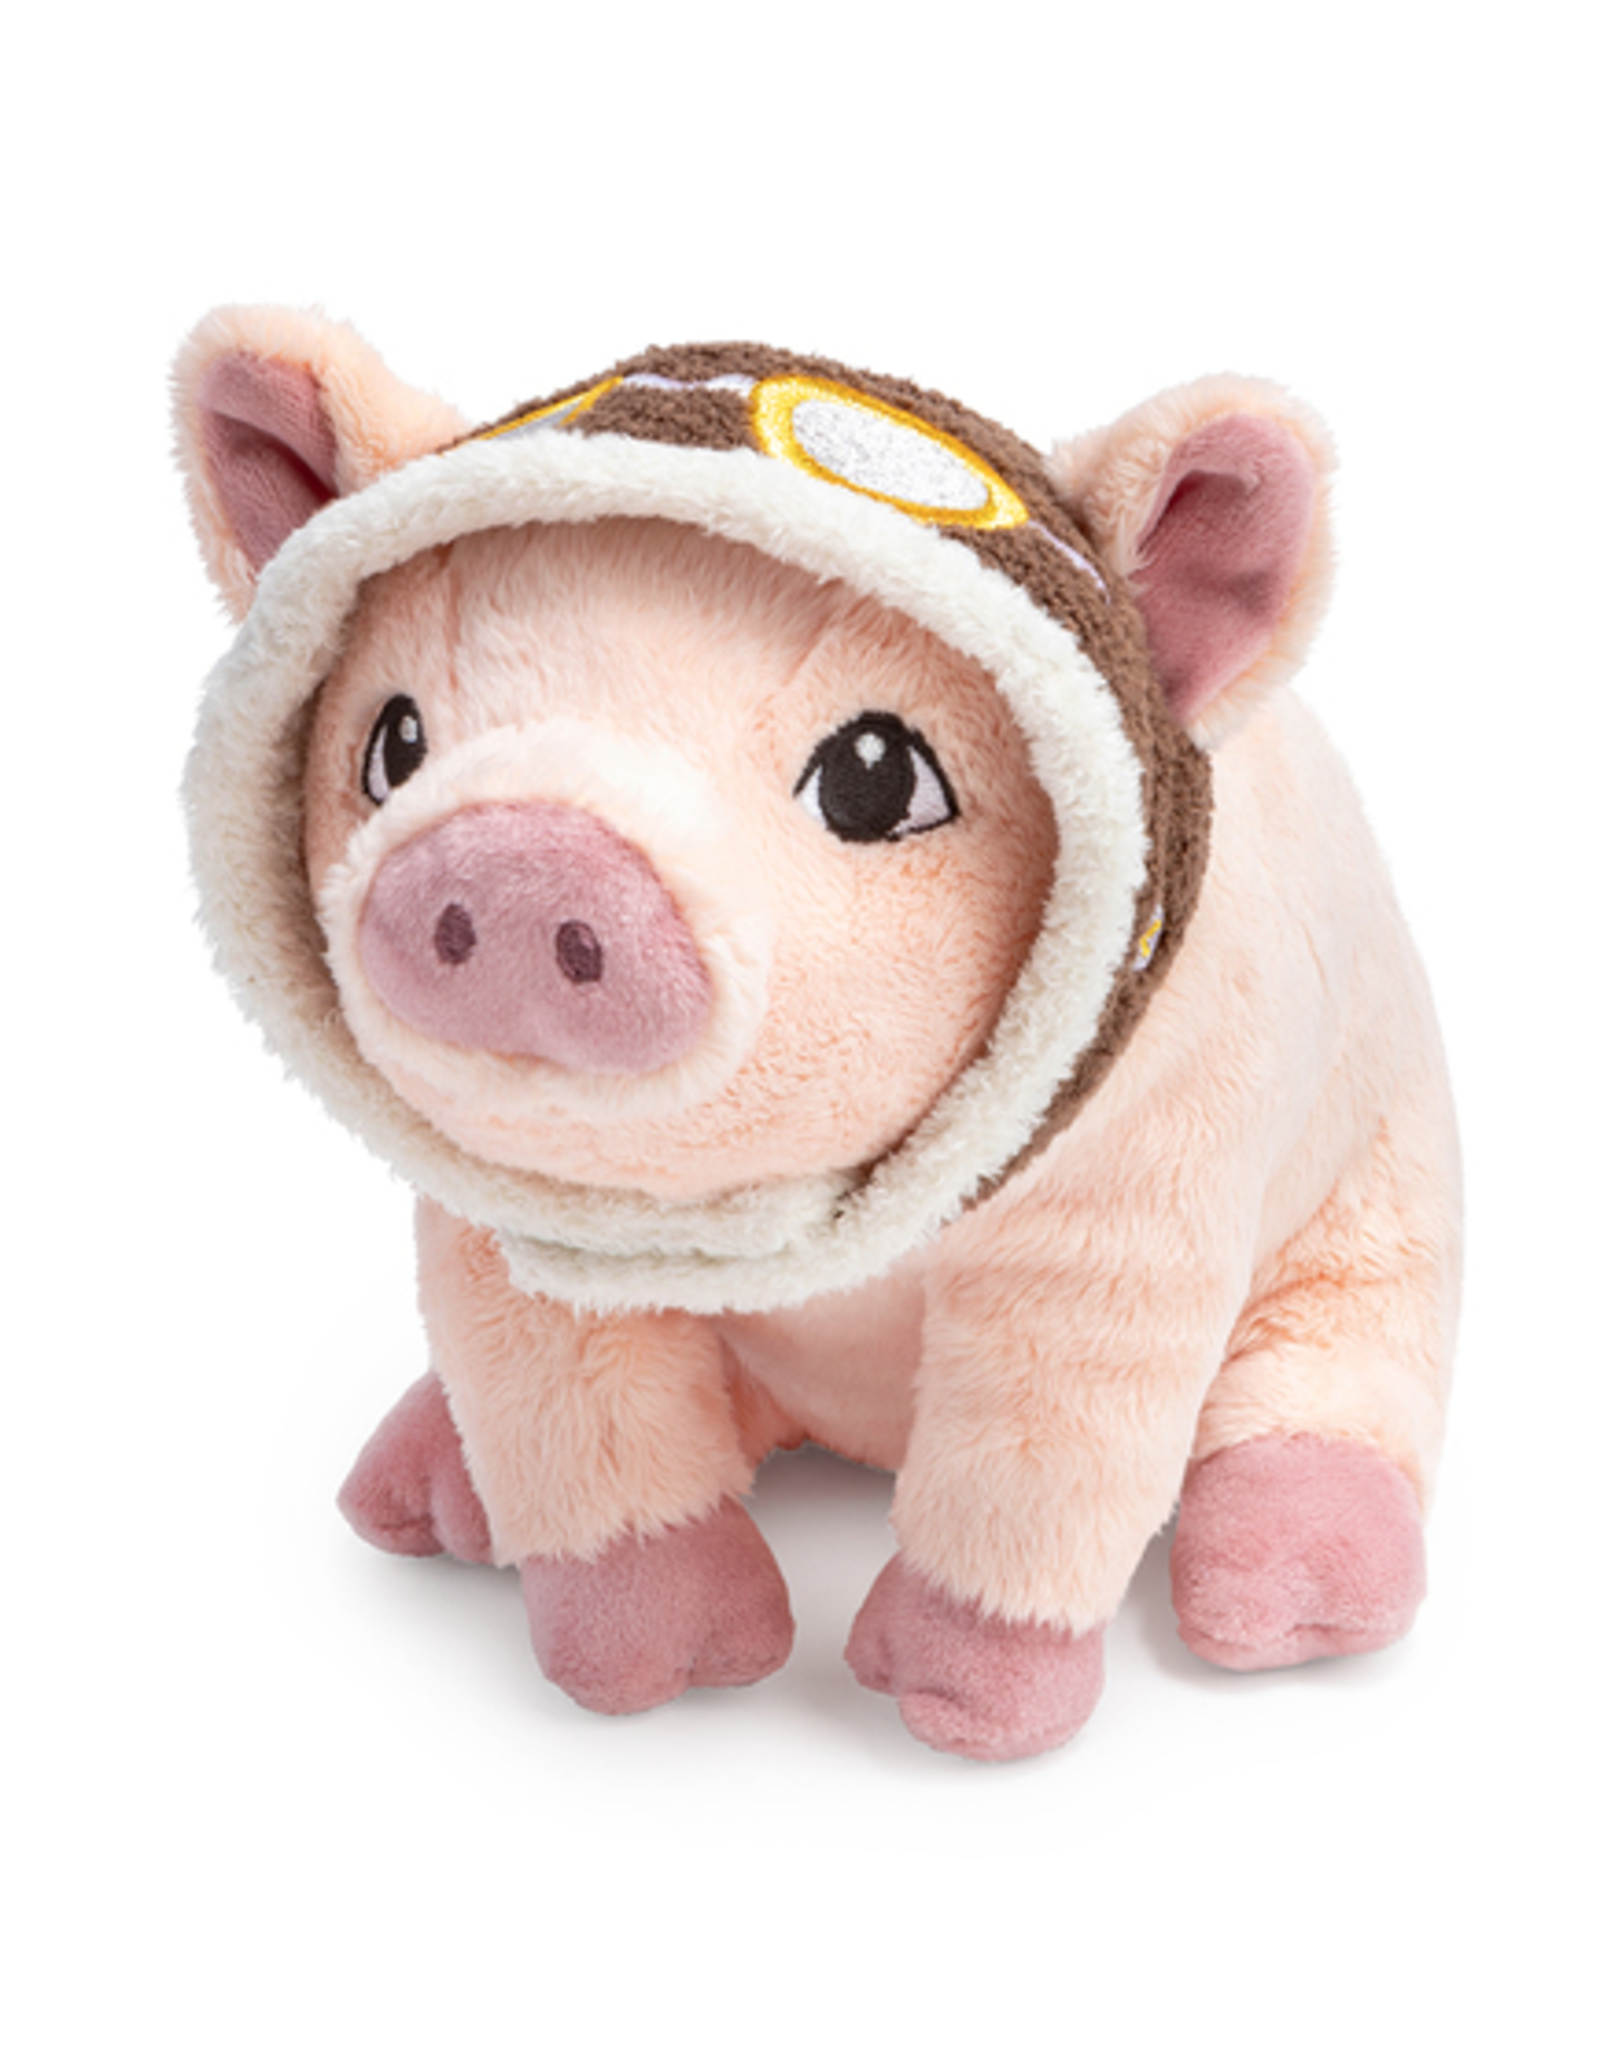 Plush Pig-Maybe